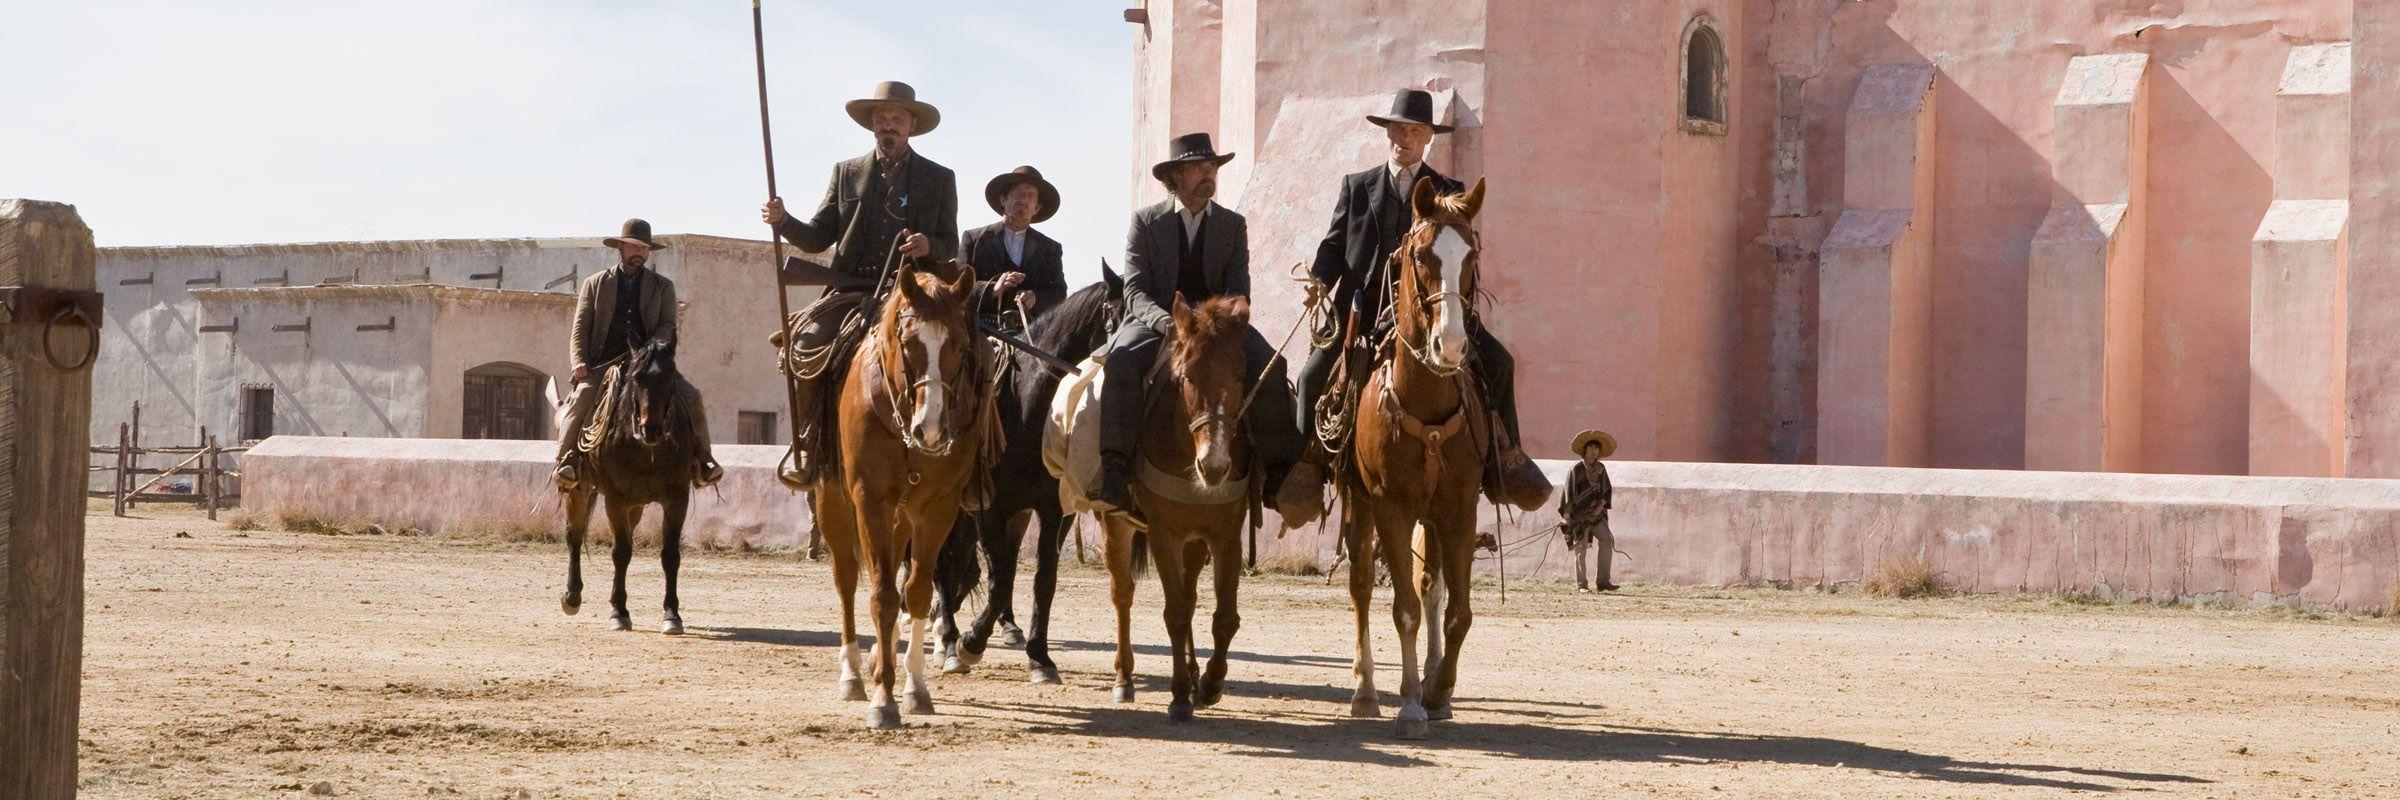 Appaloosa | Full Movie | Movies Anywhere